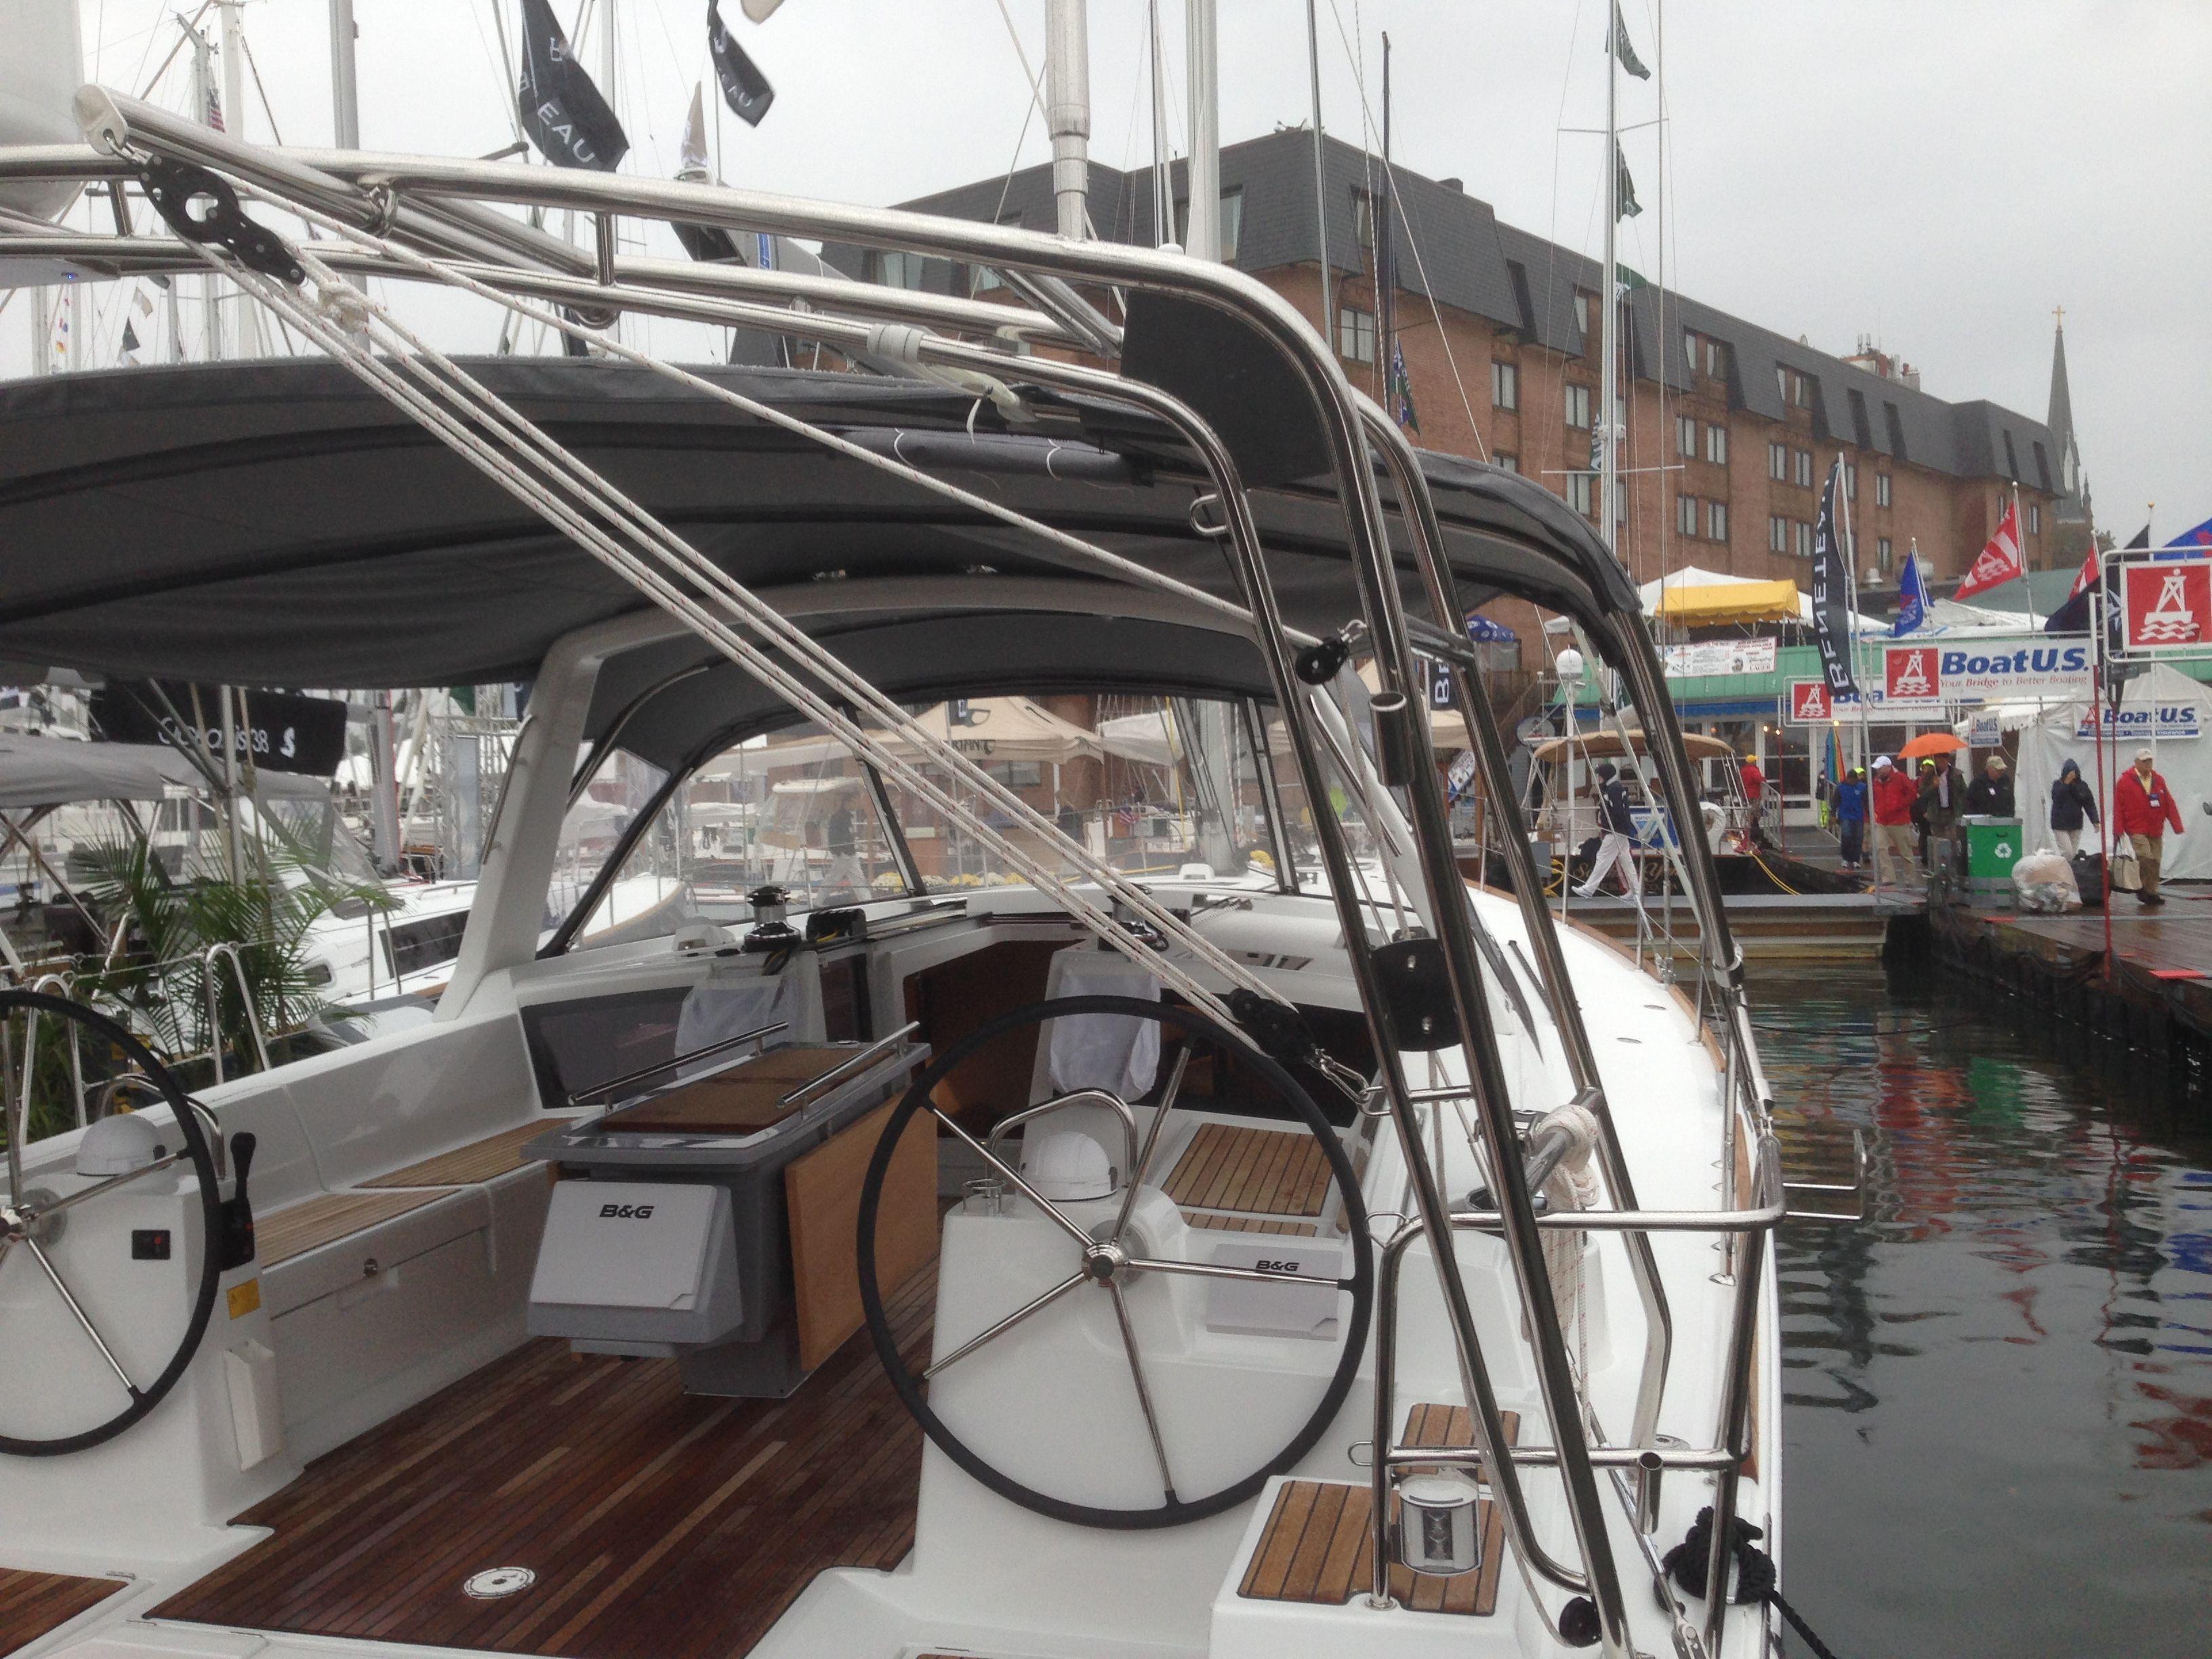 Beneteau Oceanis 48 Bimini And Arch Http Www Murrayyachtsales Com Sailing Beneteau Beneteau Oceanis 48 Sail Cockpit Bimini Dinghy